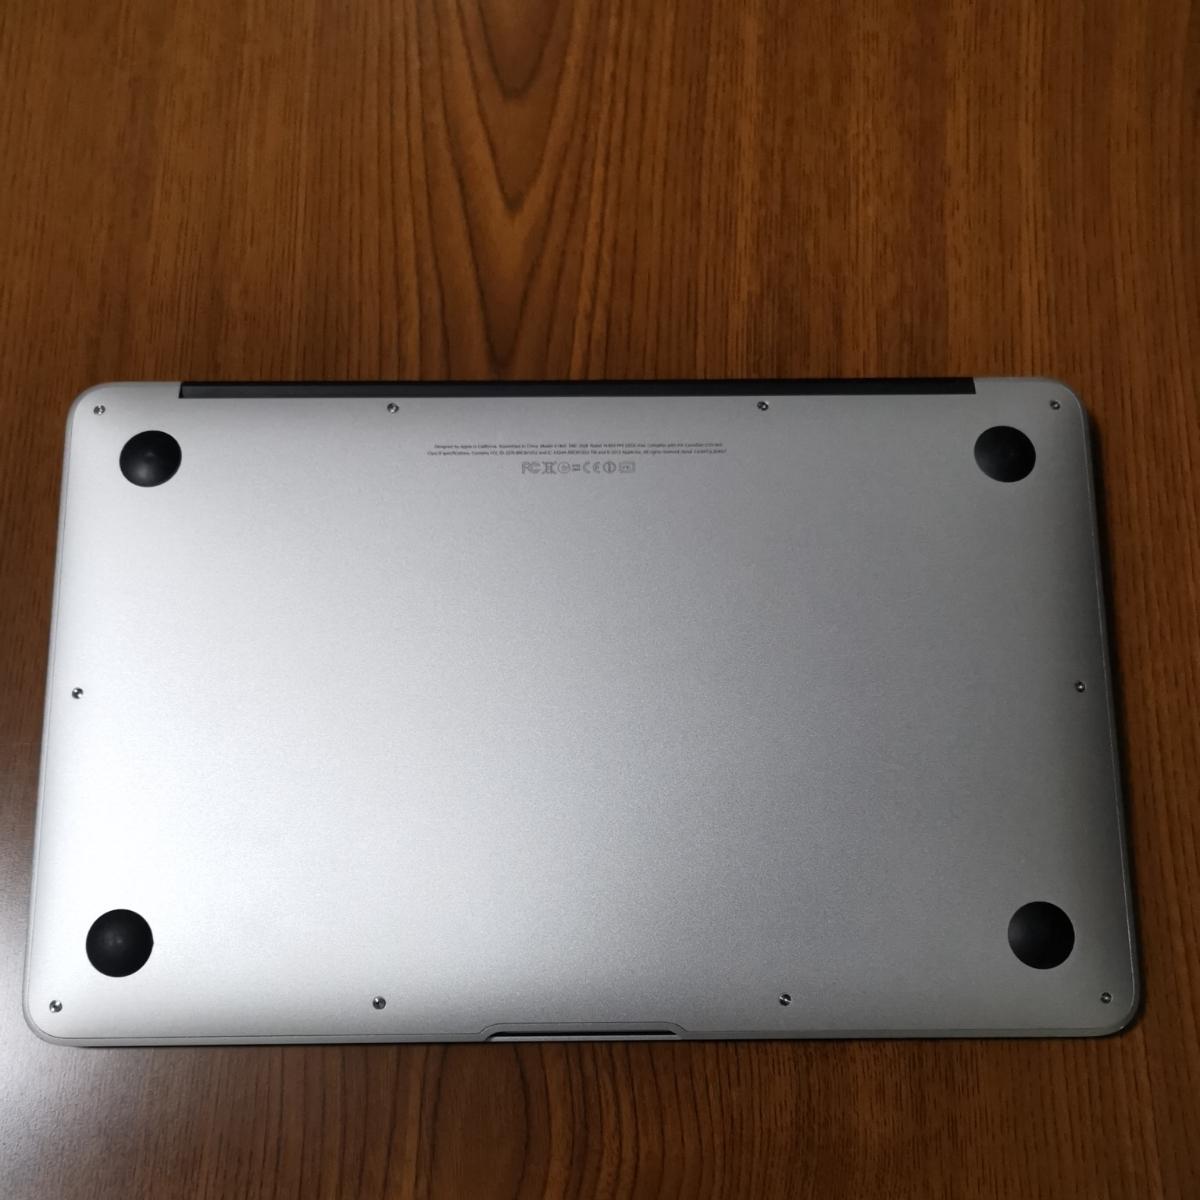 Apple MacBook Air 11インチ 2012 i5 4GB 128GB Mojave 動作確認済み 美品 Mac アップル SSD_画像5